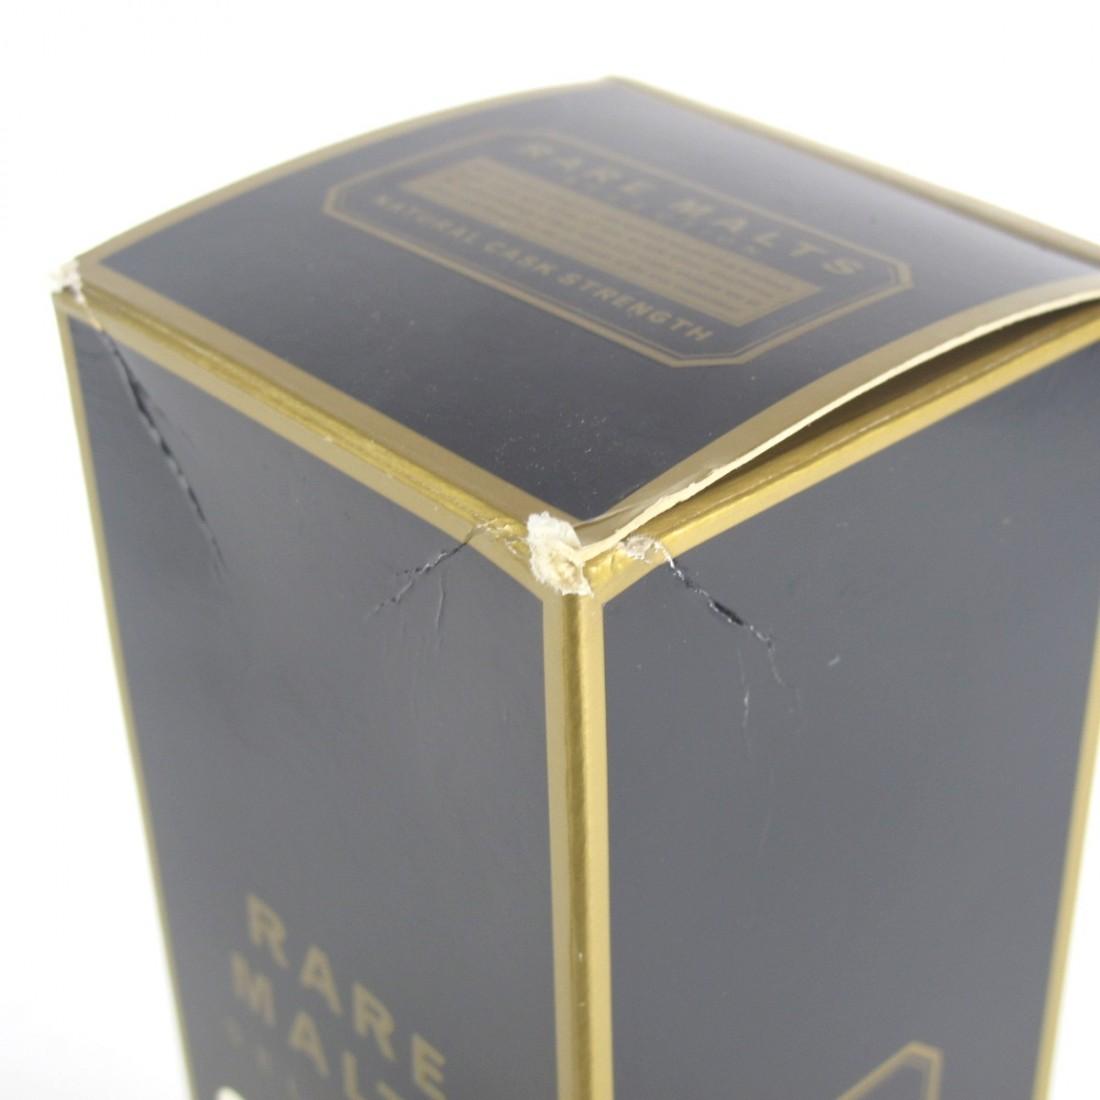 Rosebank 1981 Rare Malt 22 Year Old / 61.1%